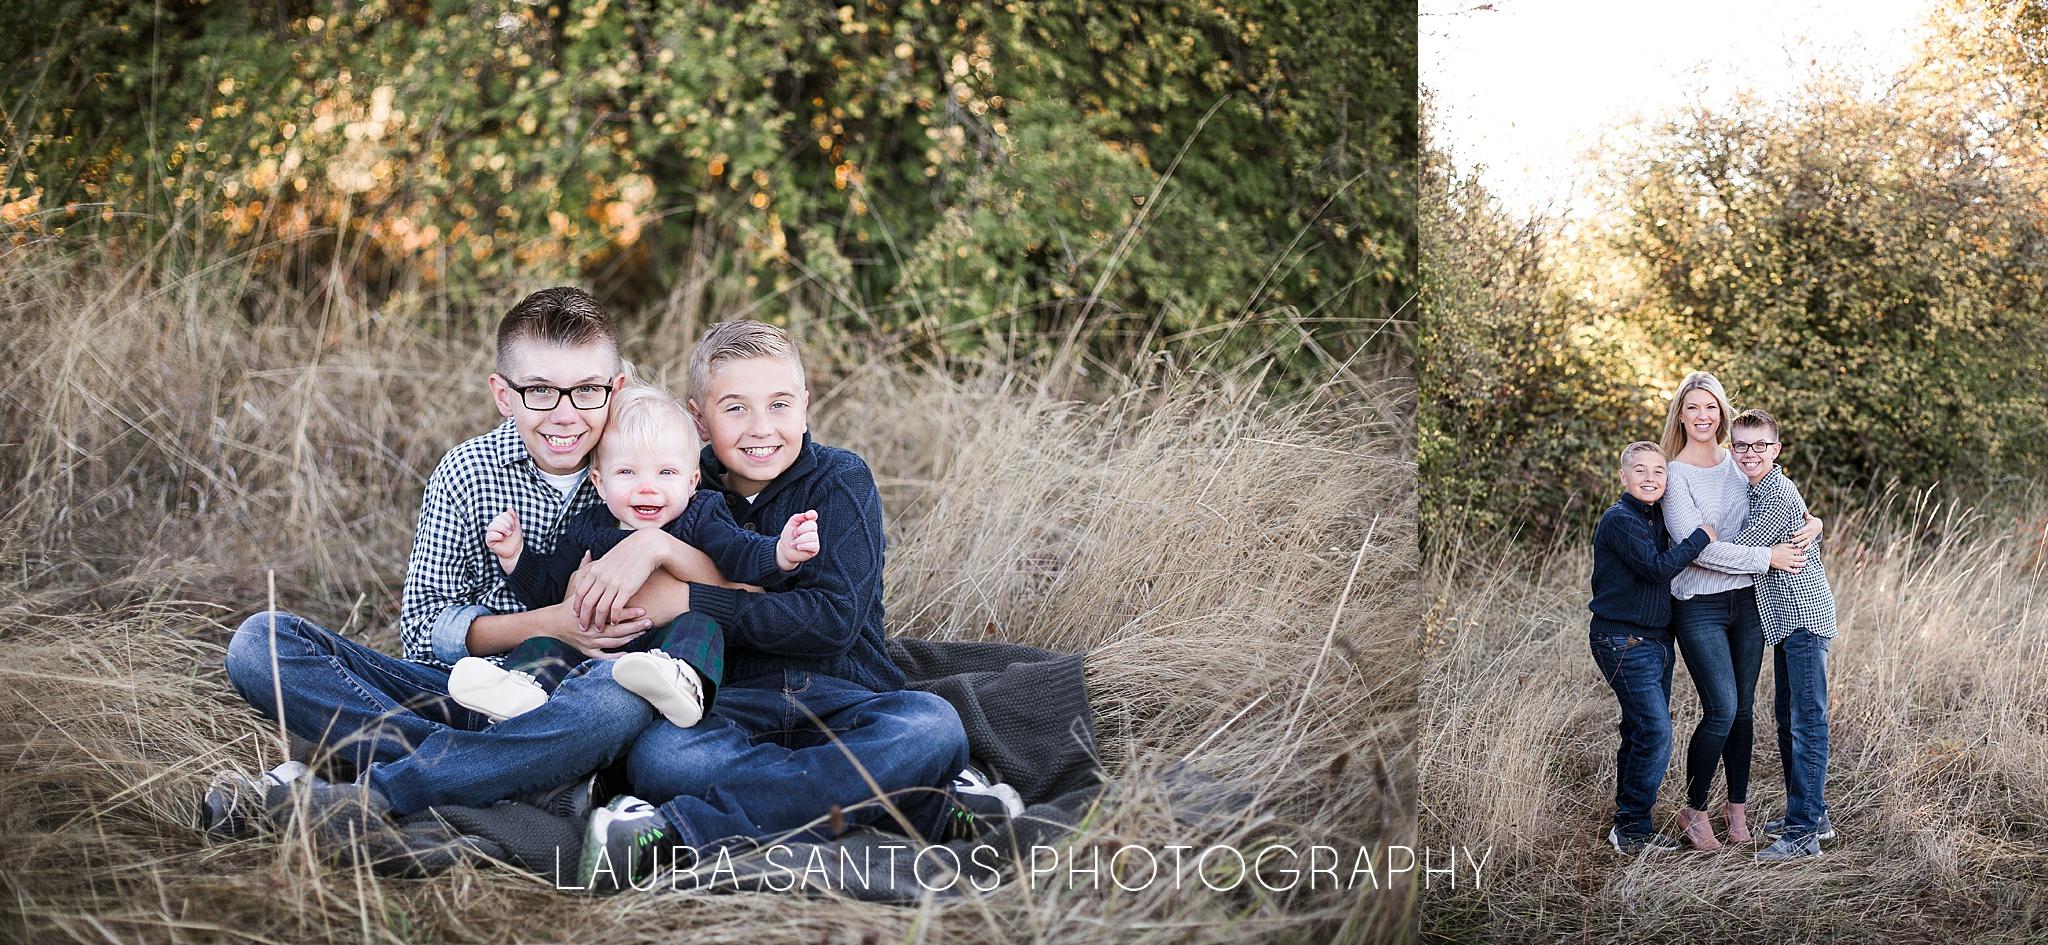 Laura Santos Photography Portland Oregon Family Photographer_0621.jpg